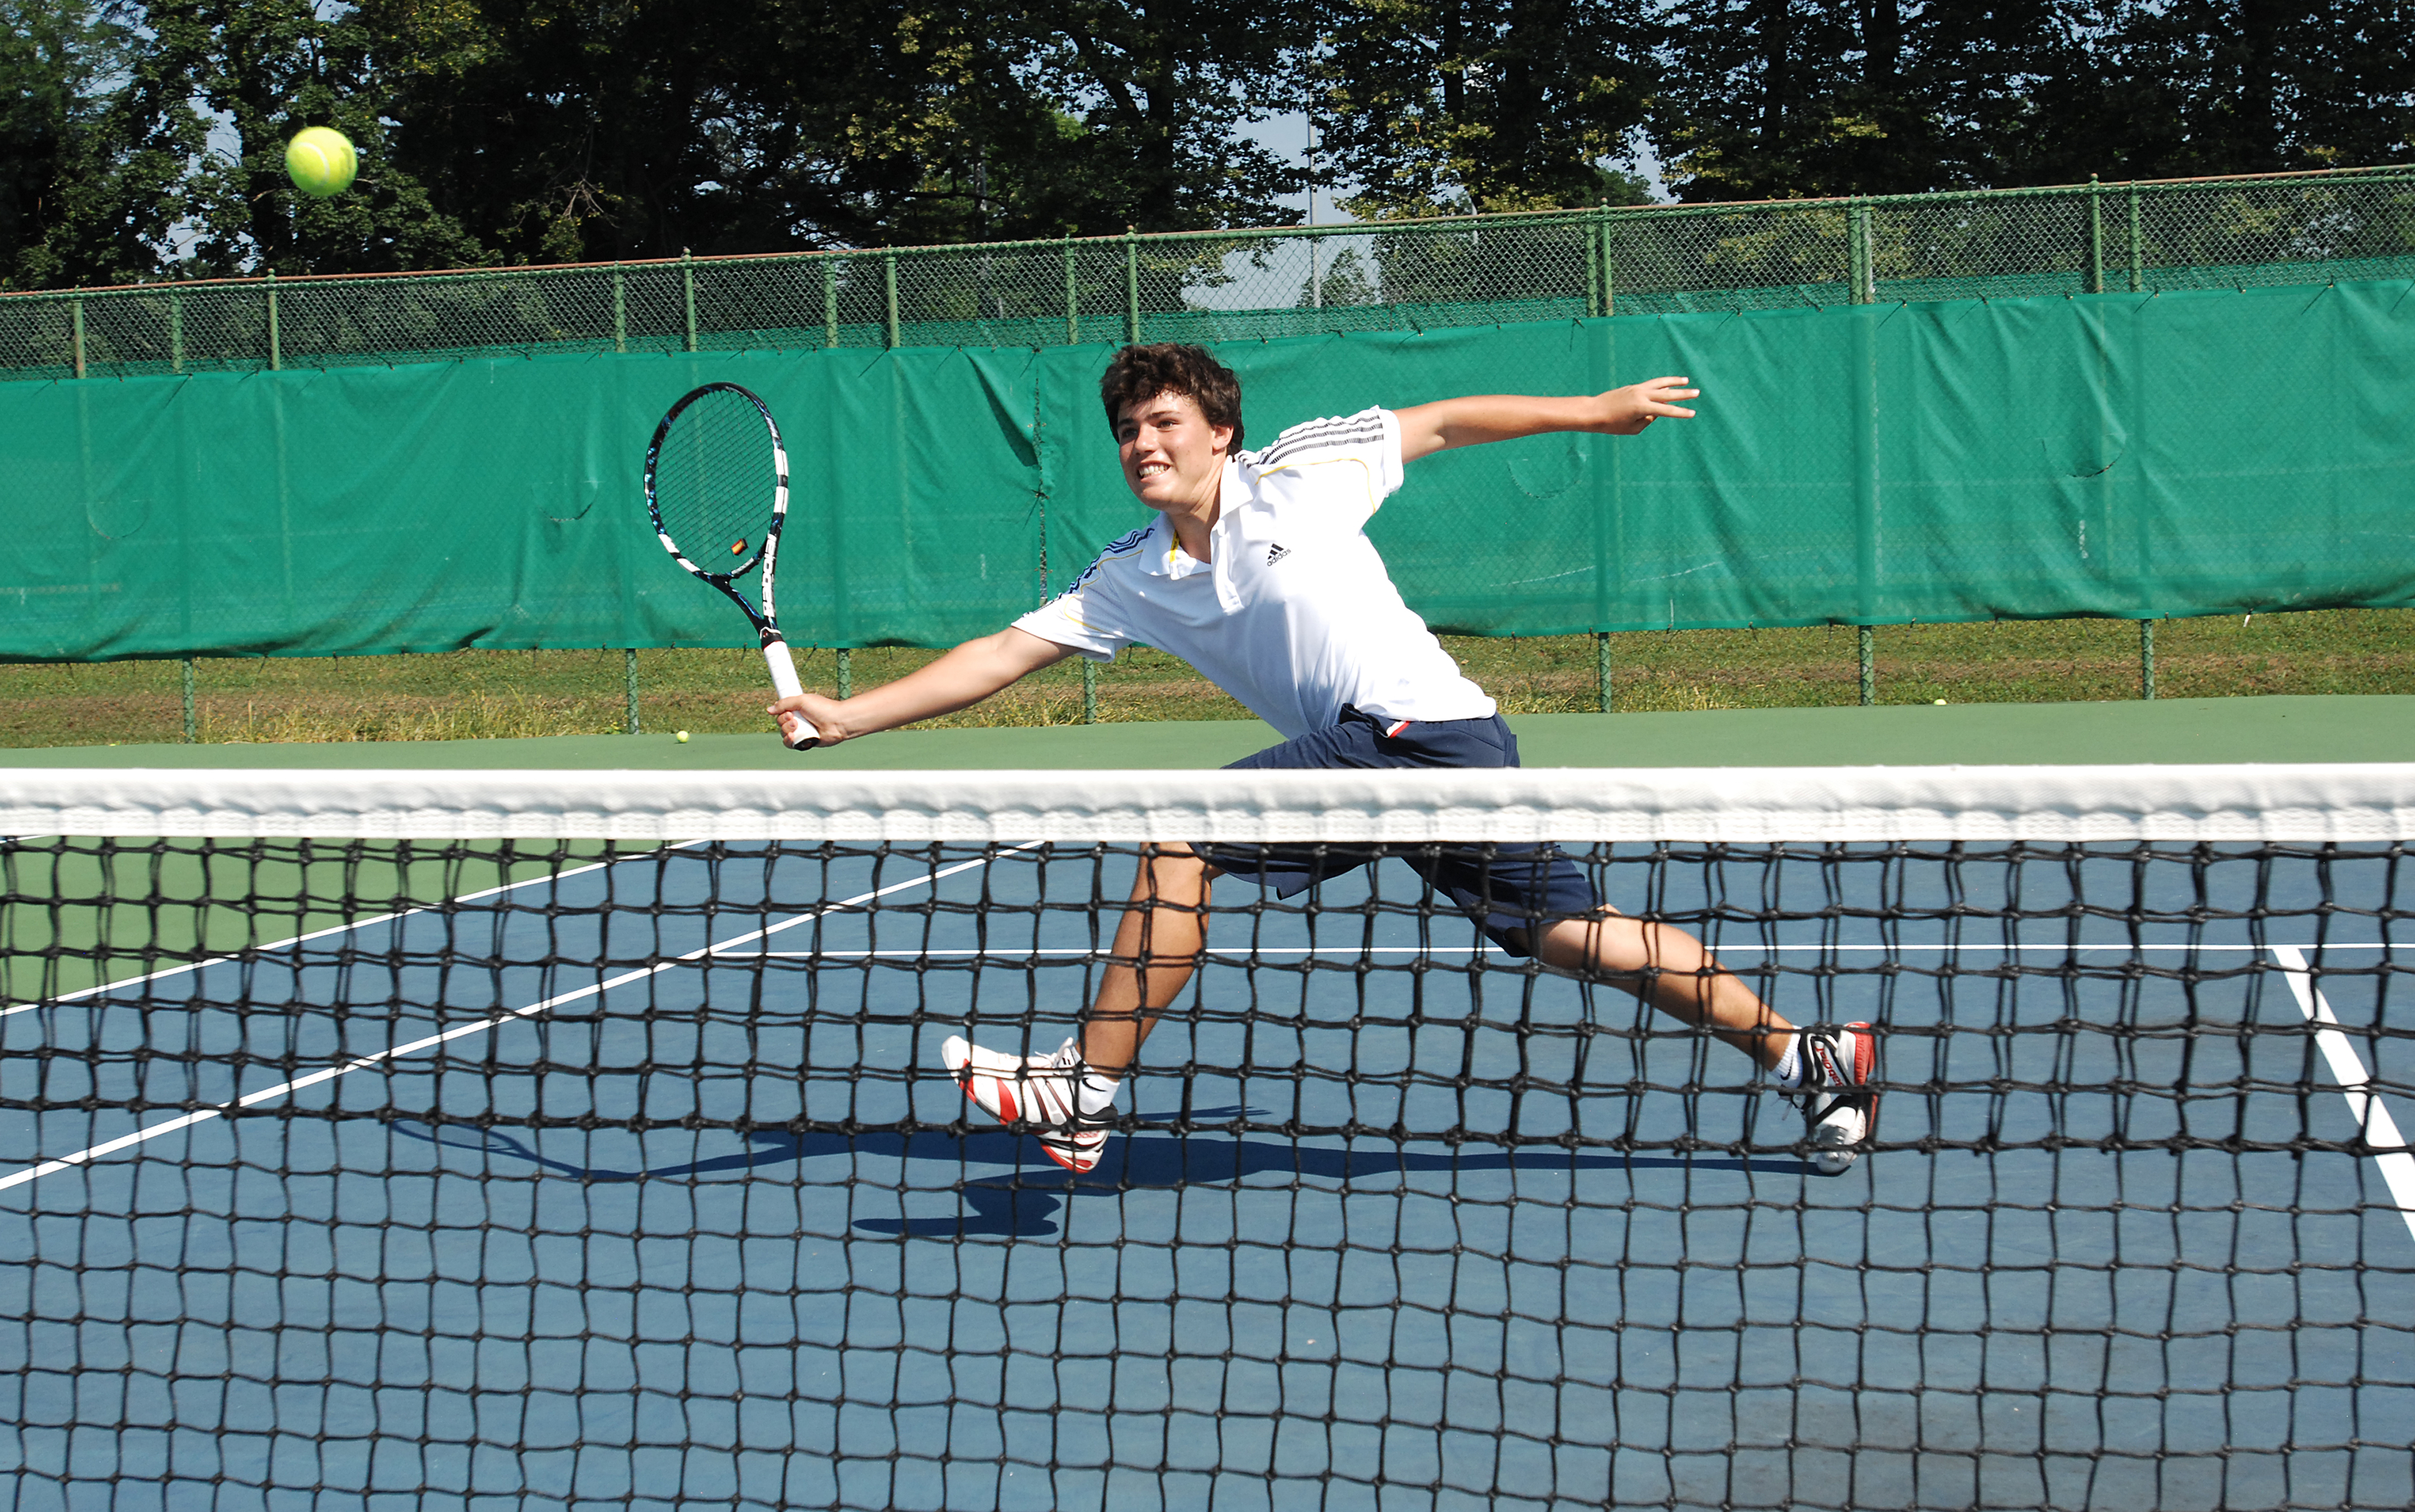 Intense_tennis